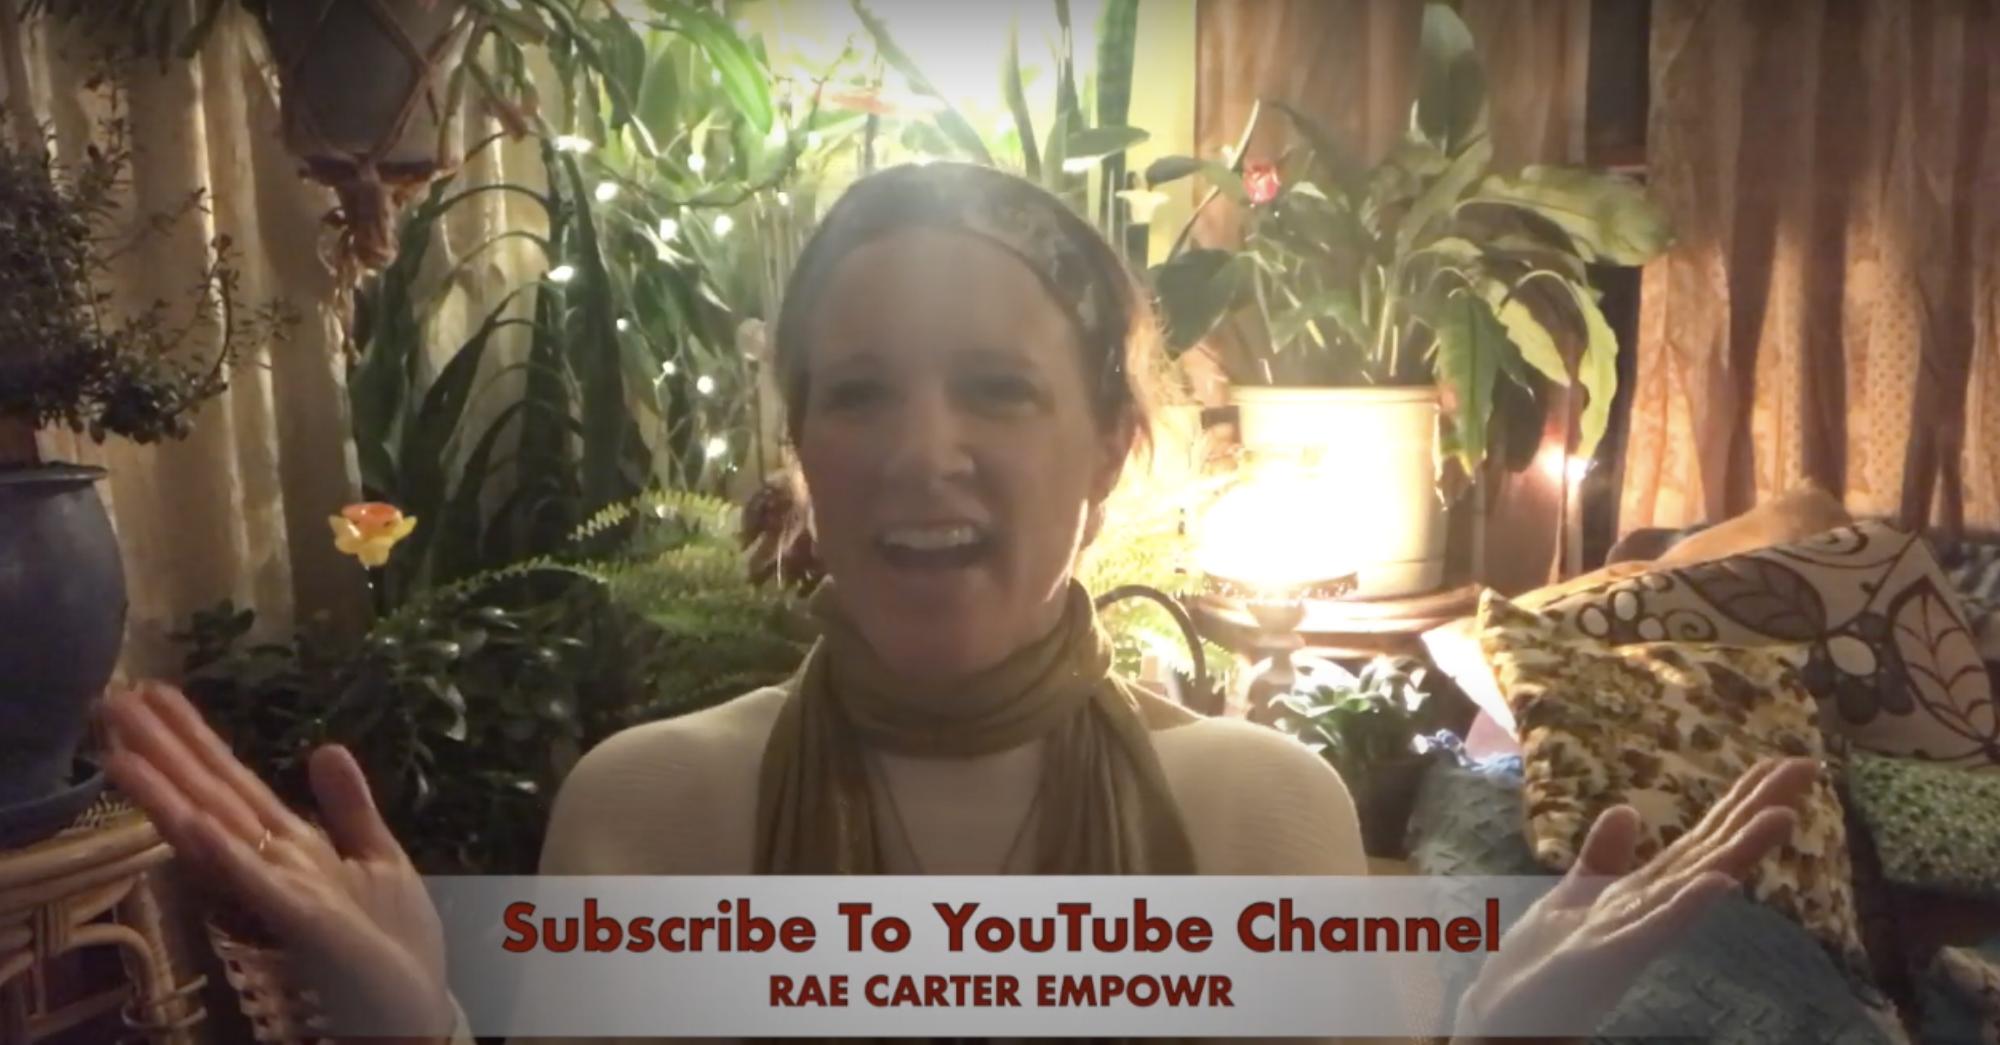 Rae Carter on You Tube